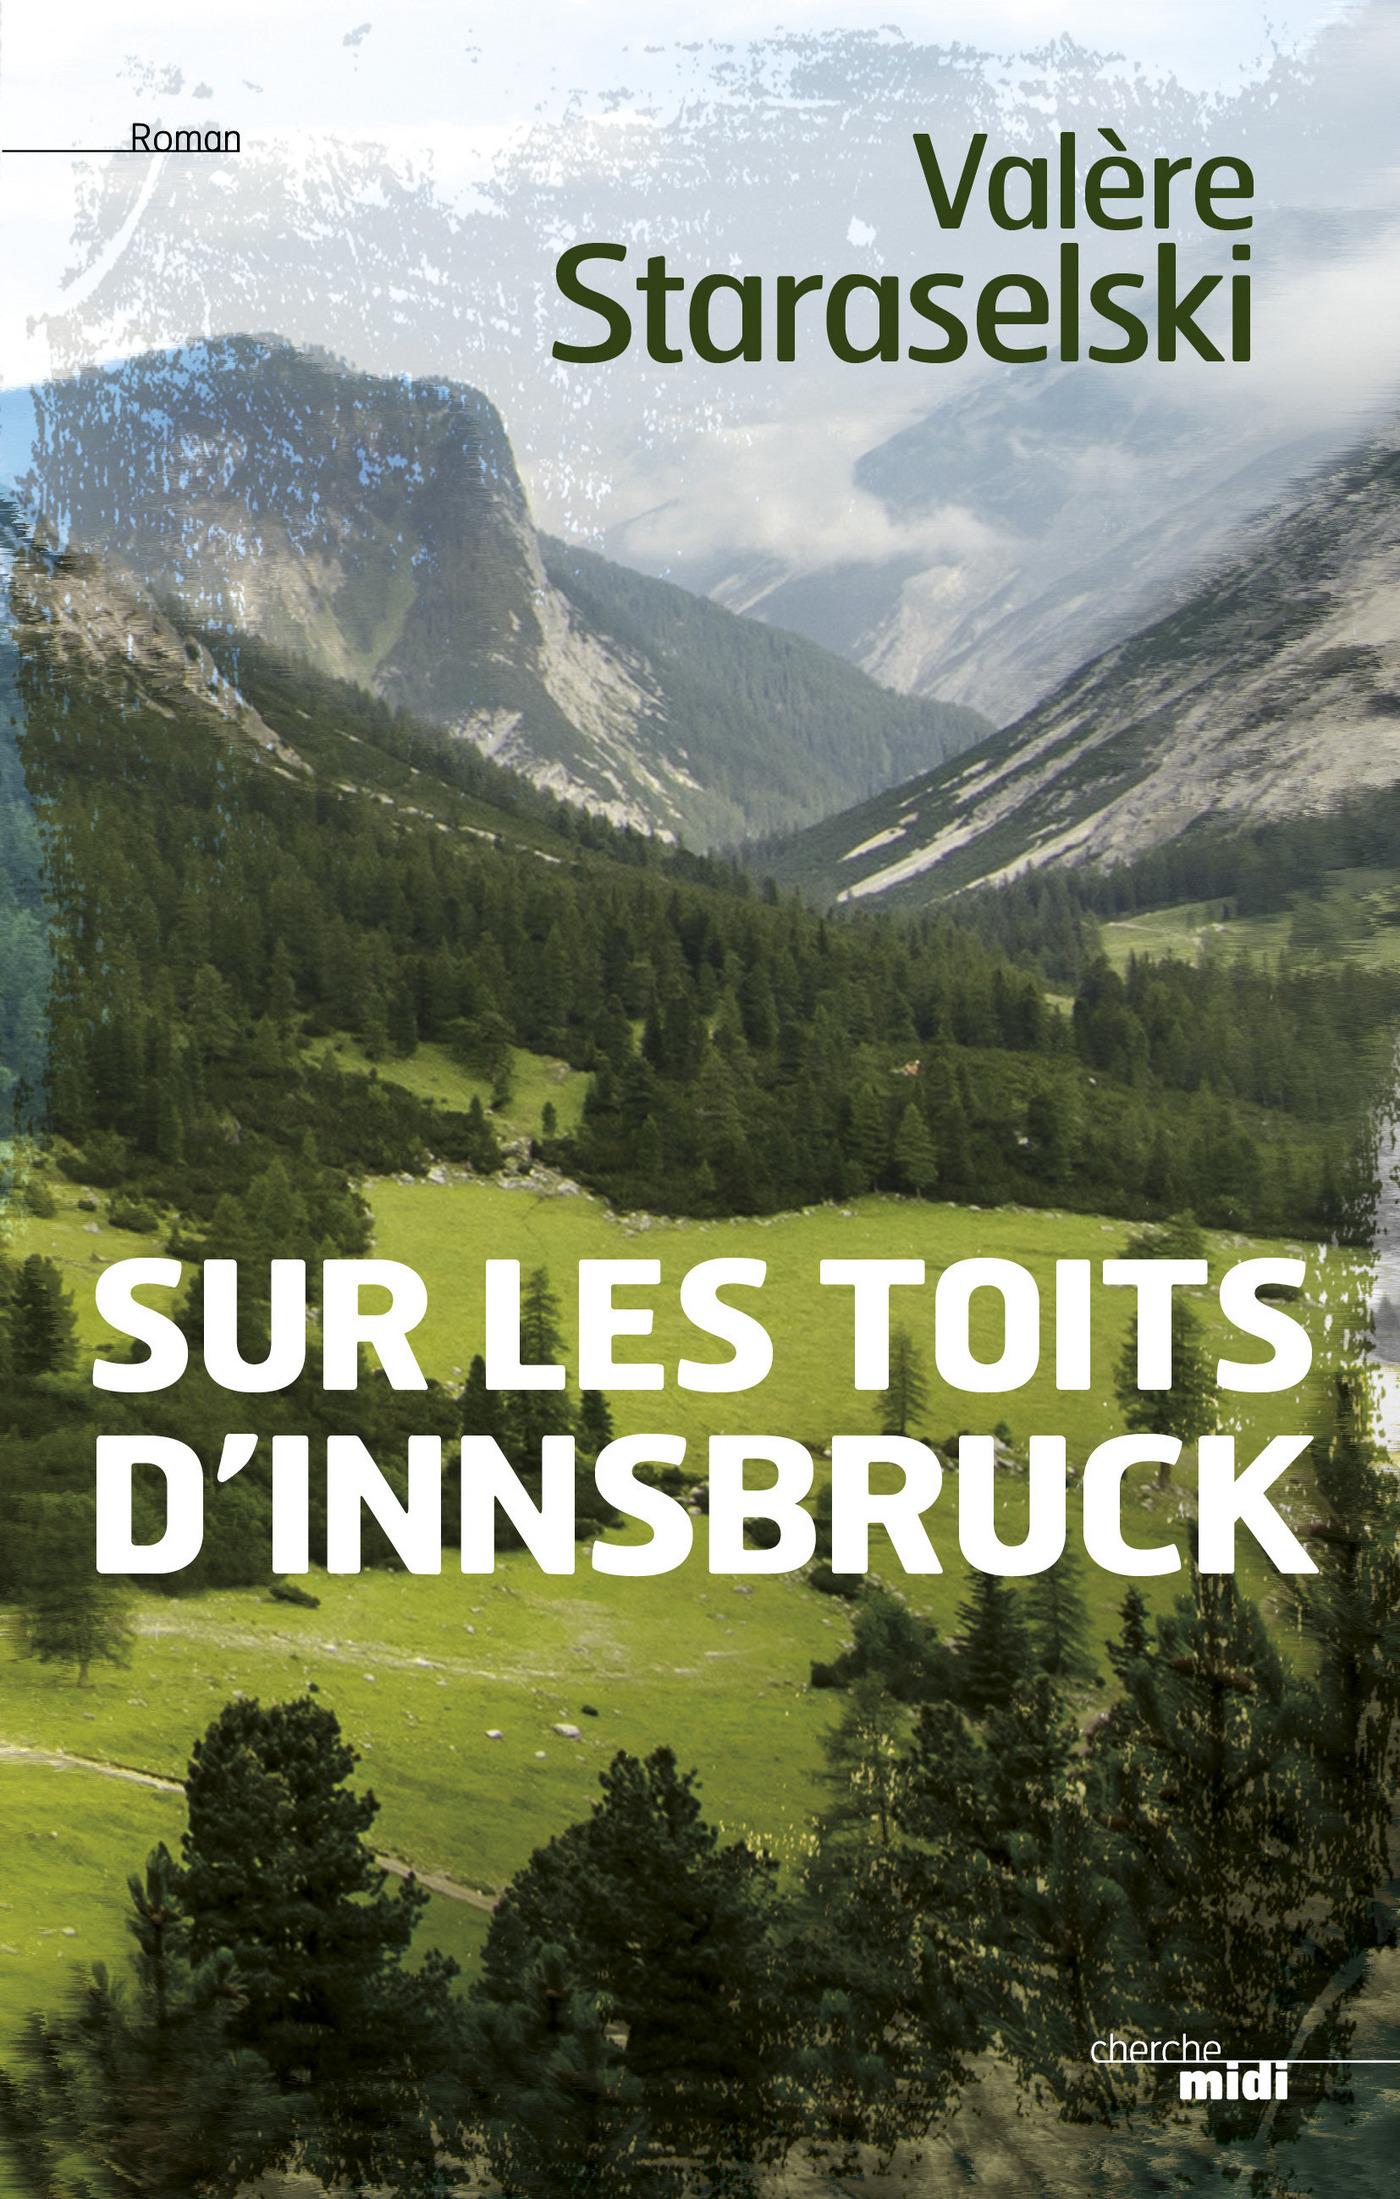 Sur les toits d'Innsbruck | STARASELSKI, Valère